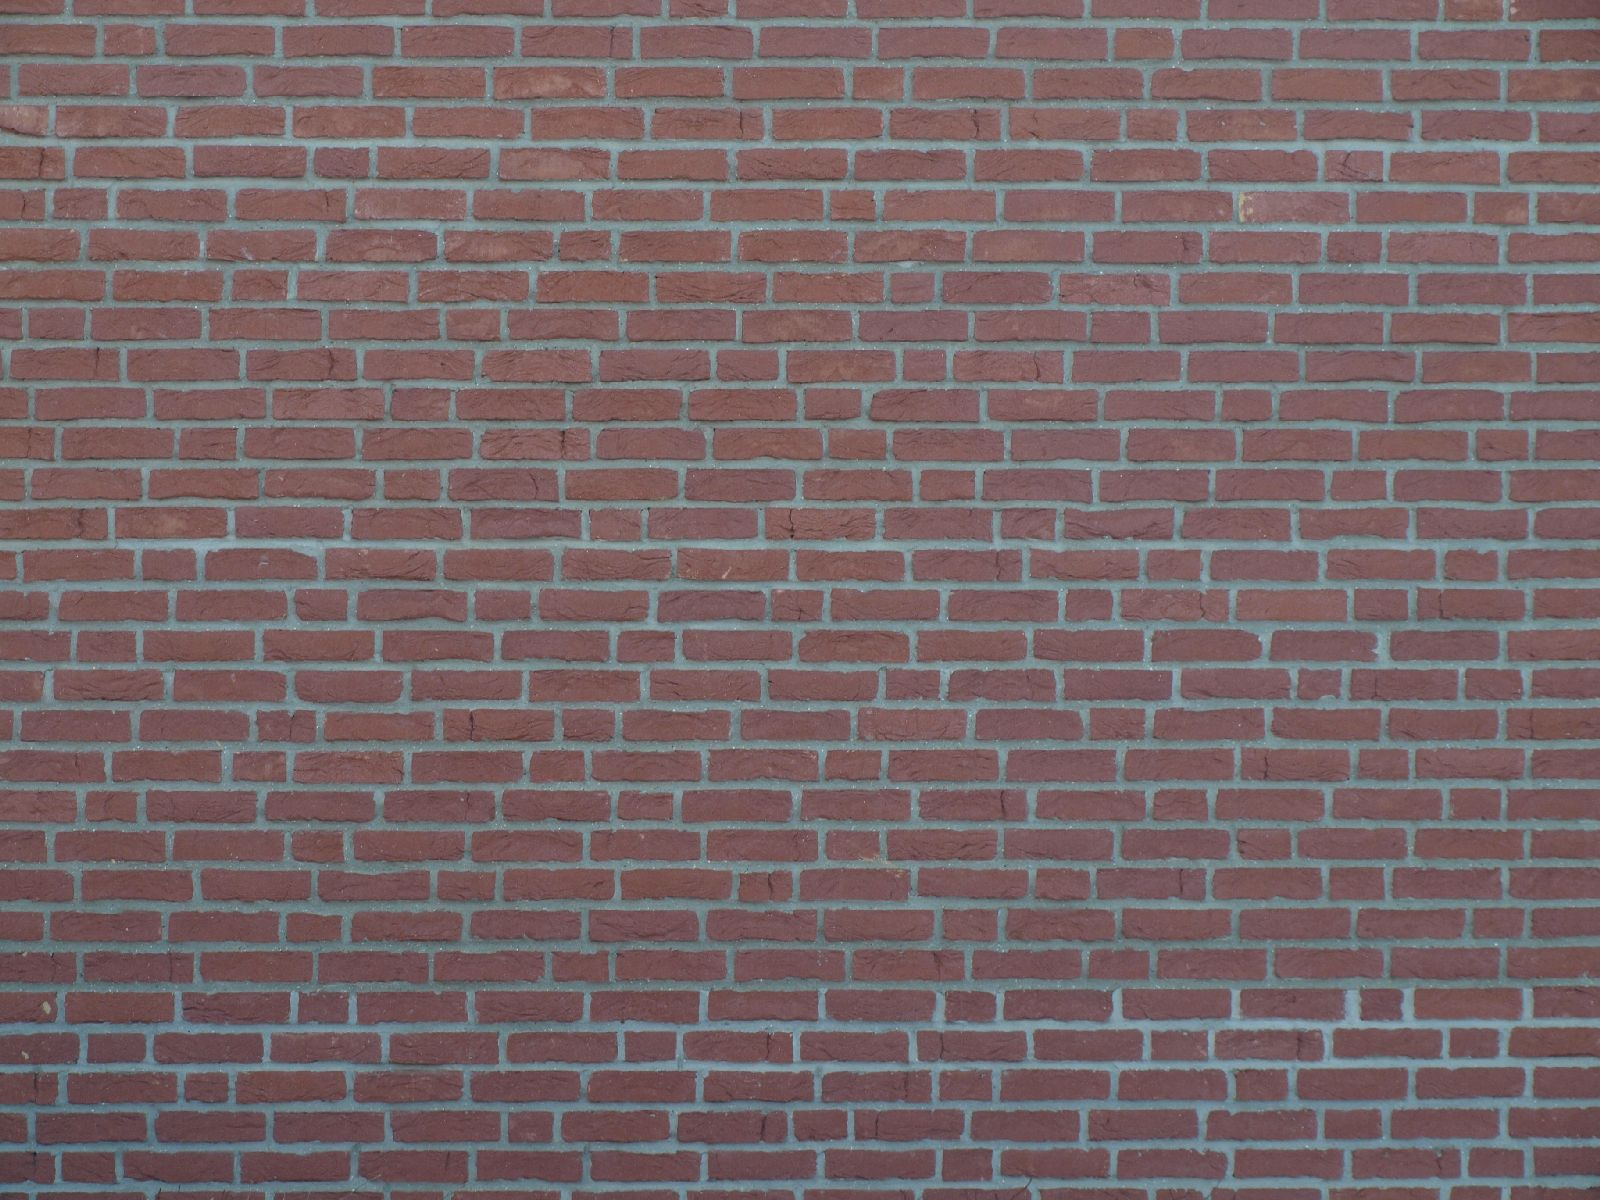 Wand-Mauerwerk-Backstein_Textur_A_P1109018